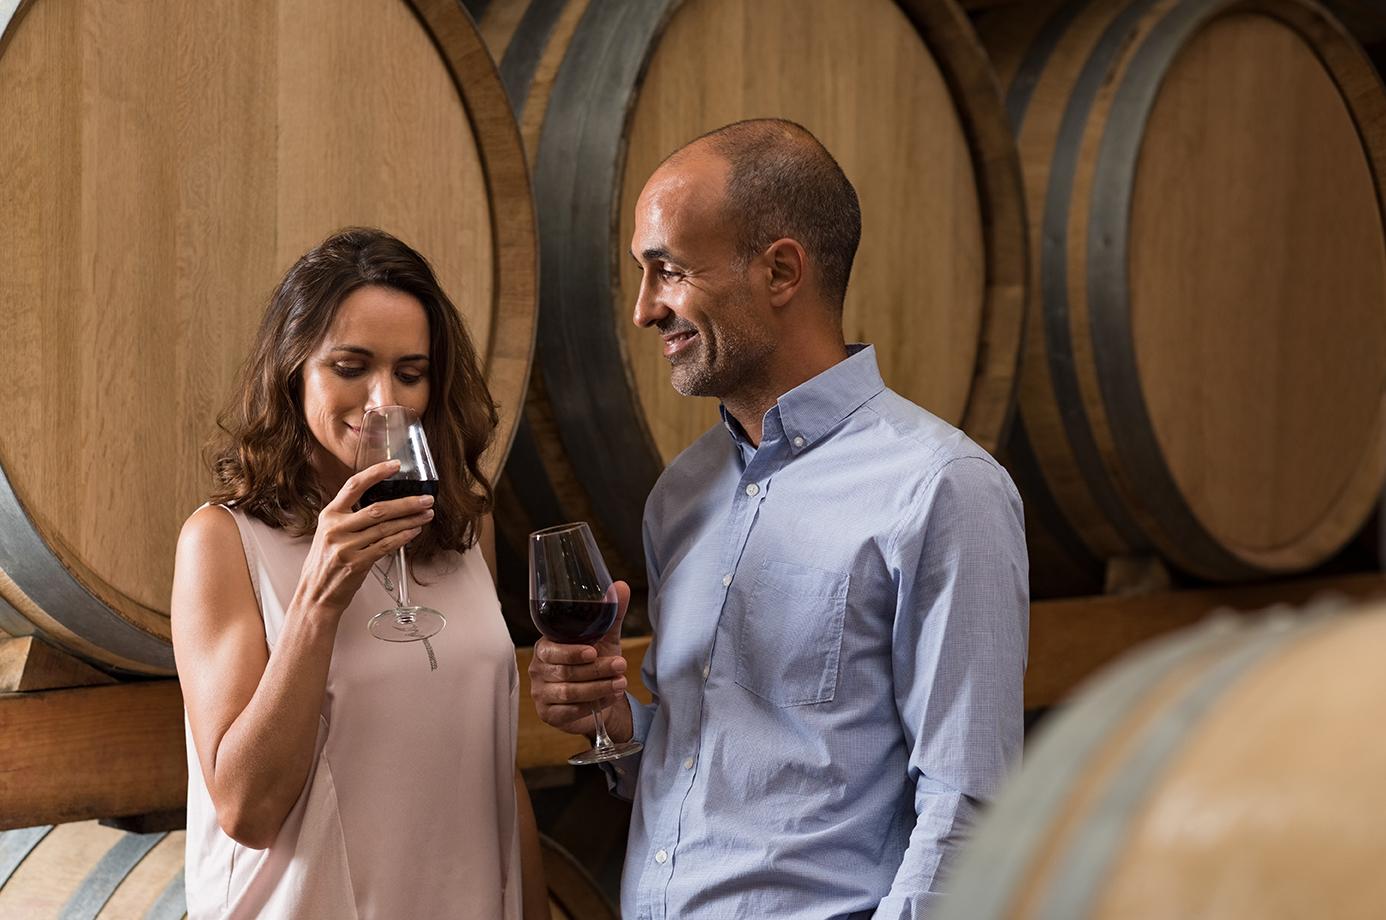 wine-tour-granite-belt.jpg